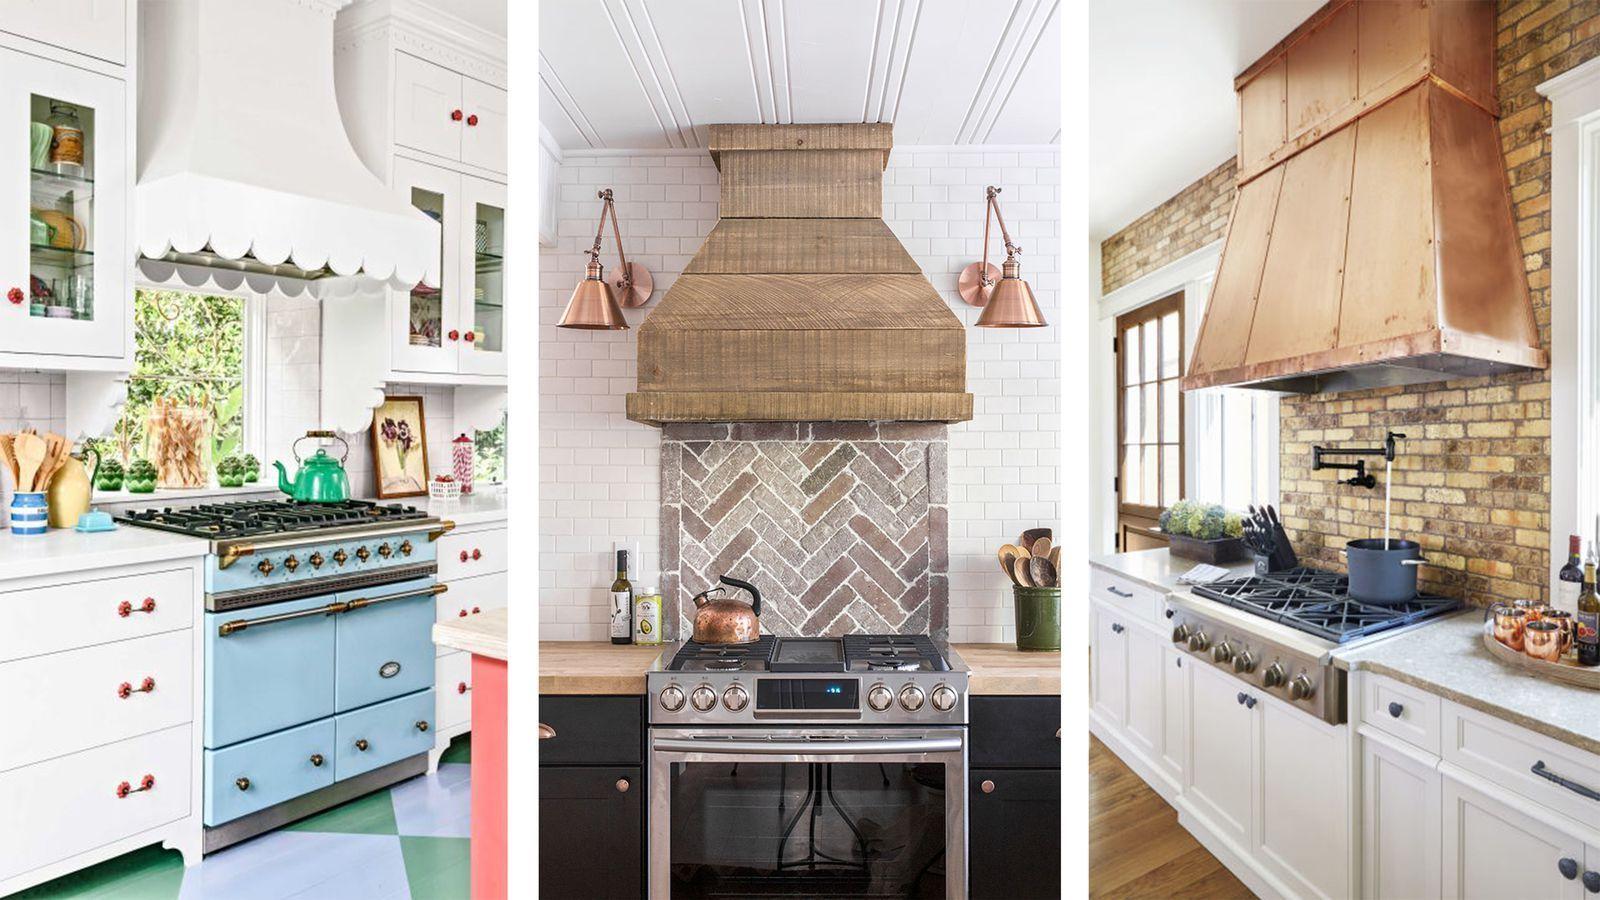 15 Kitchen Range Hoods That Made A Kitchen Look So Much  Prettiercountryliving #KitchenRanges